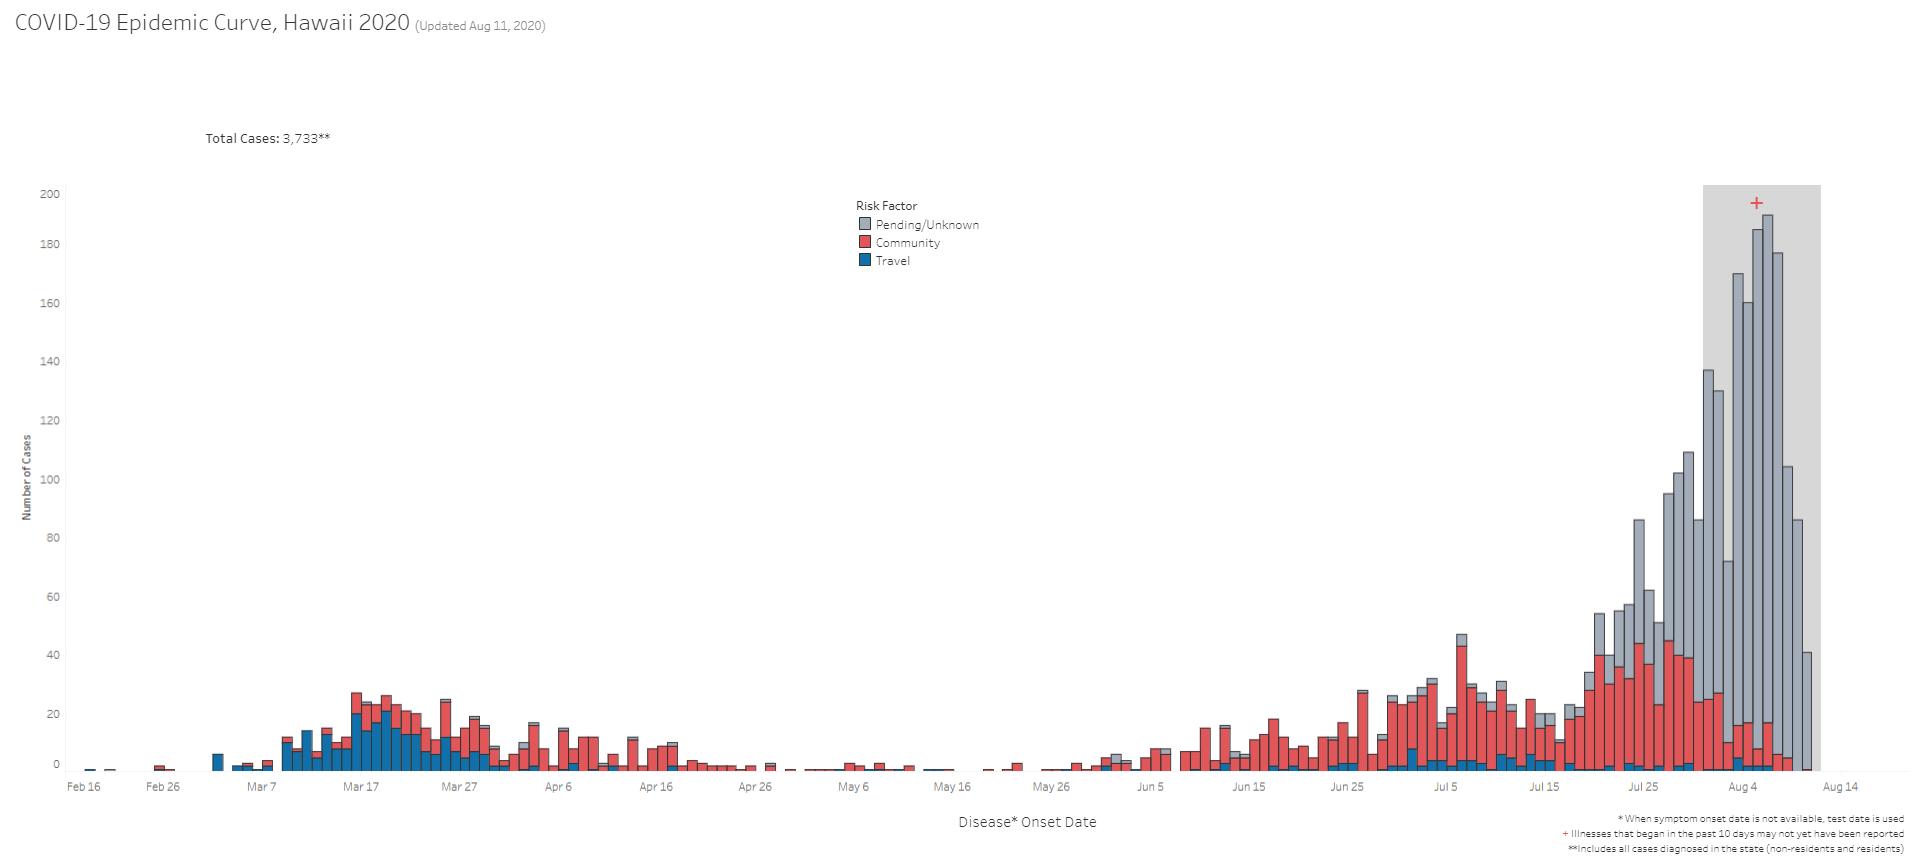 COVID-19 Epidemic Curve Hawaii August 11, 2020